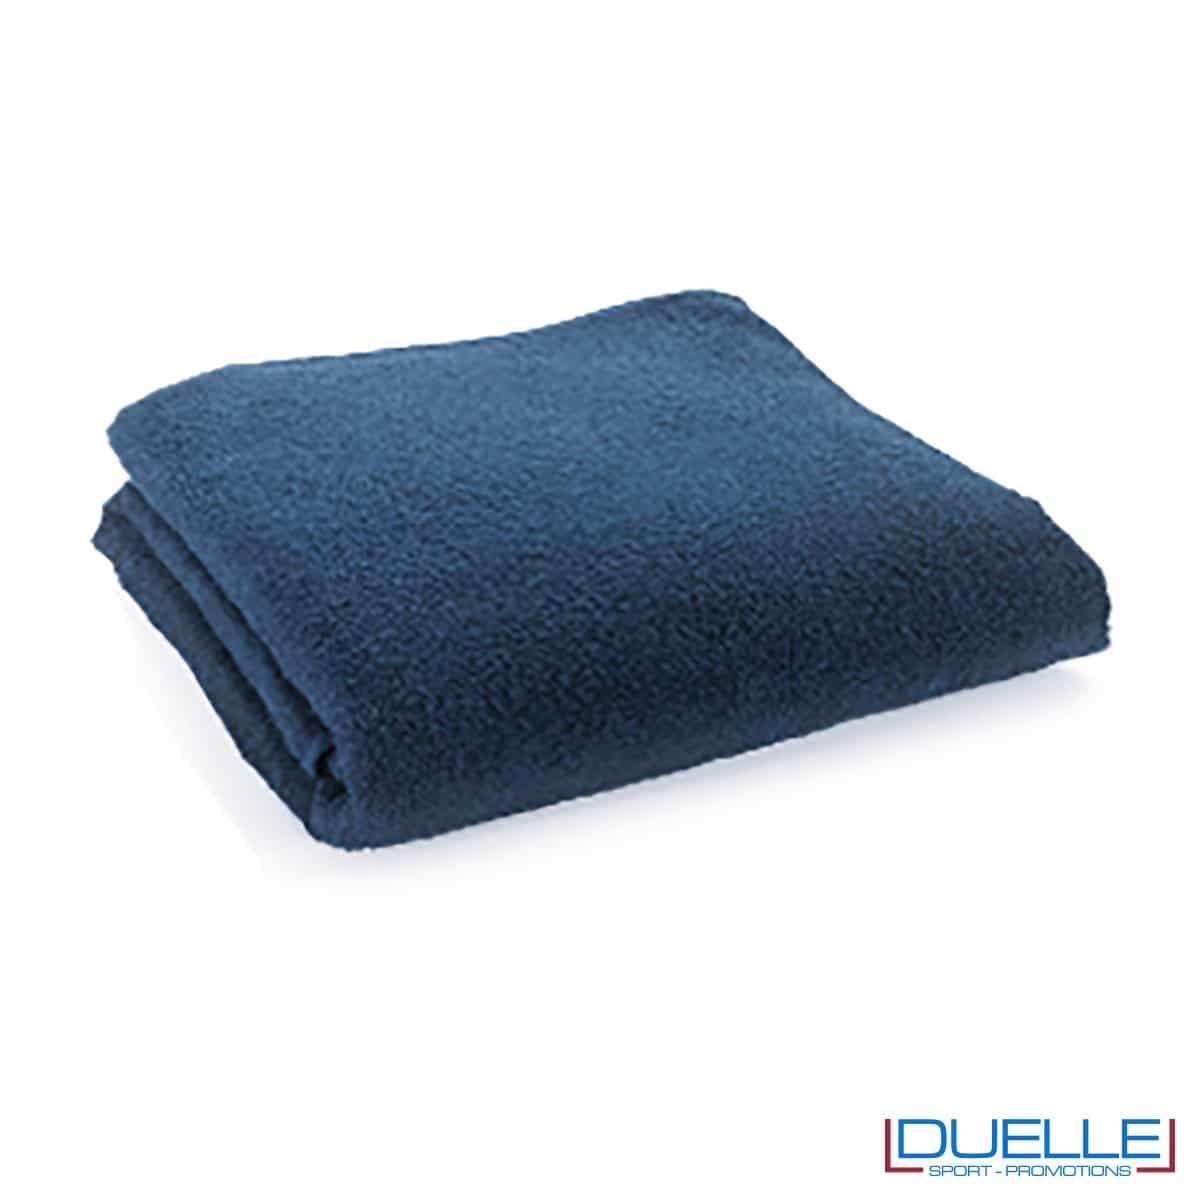 telo personalizzato cotone blu navy, gadget mare, gadget personalizzato blu navy